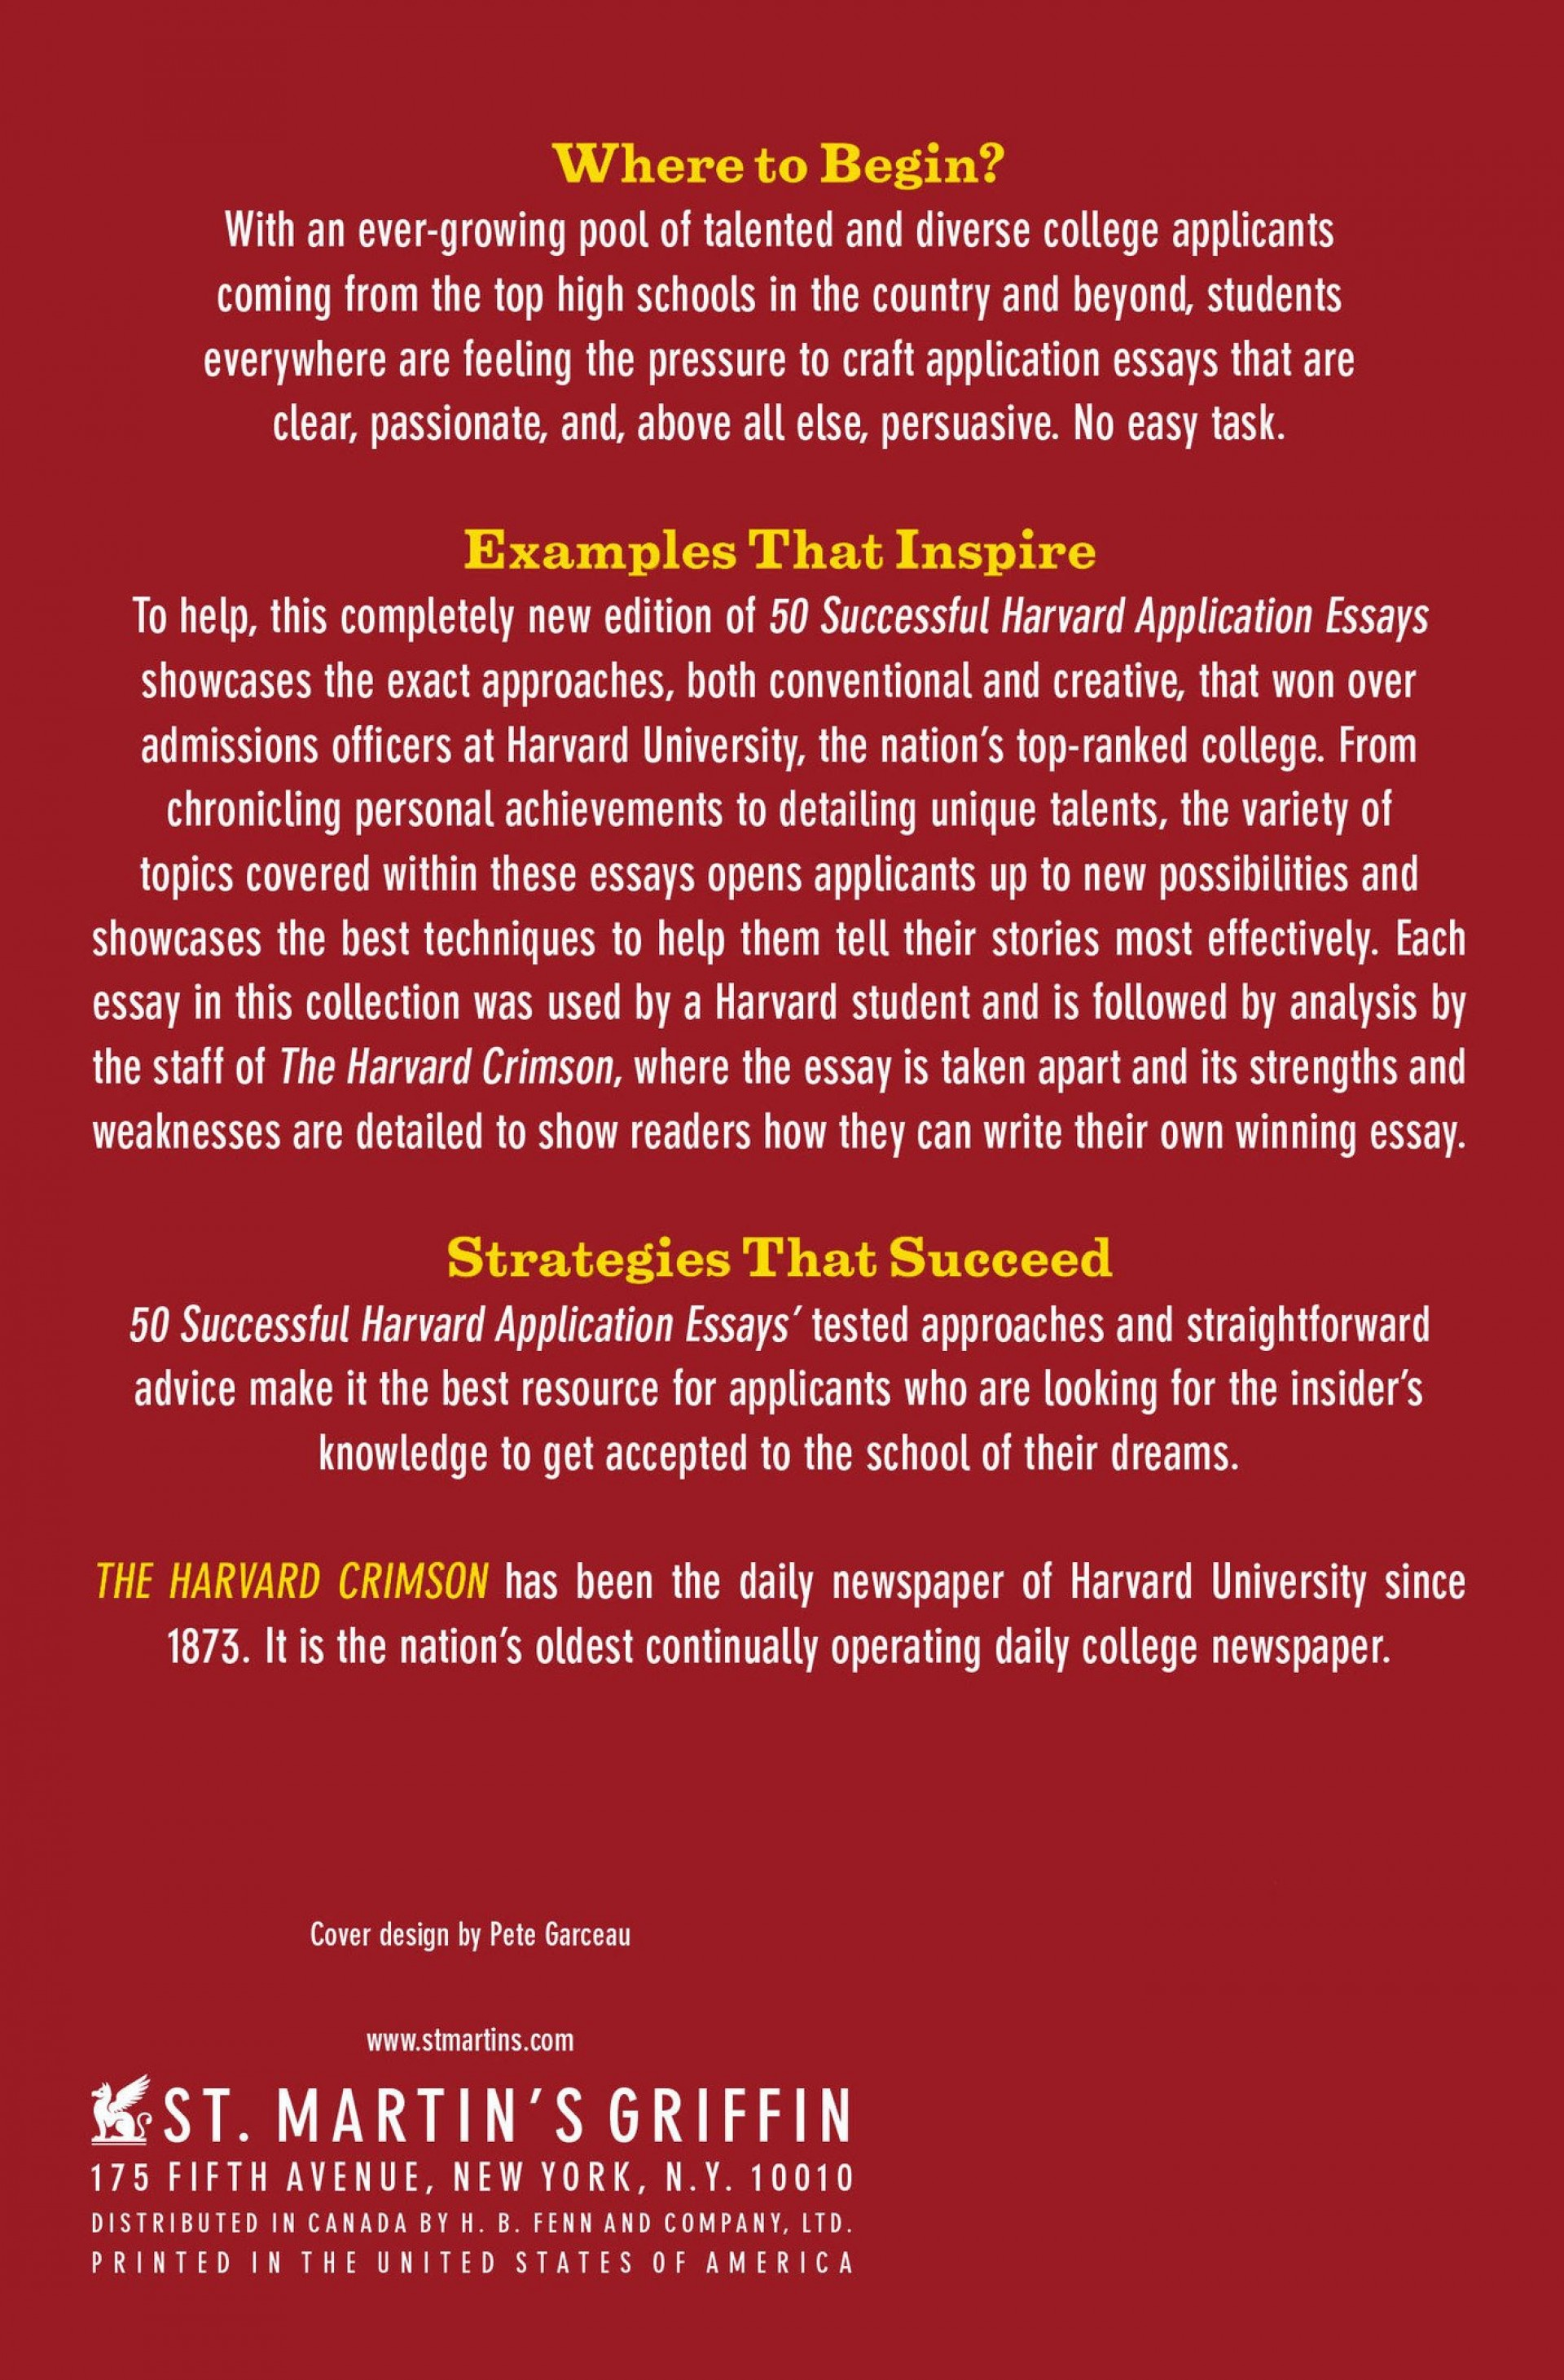 013 815kp6cfuhl Harvard Accepted Essays Essay Fantastic Business School Reddit College Book 1920